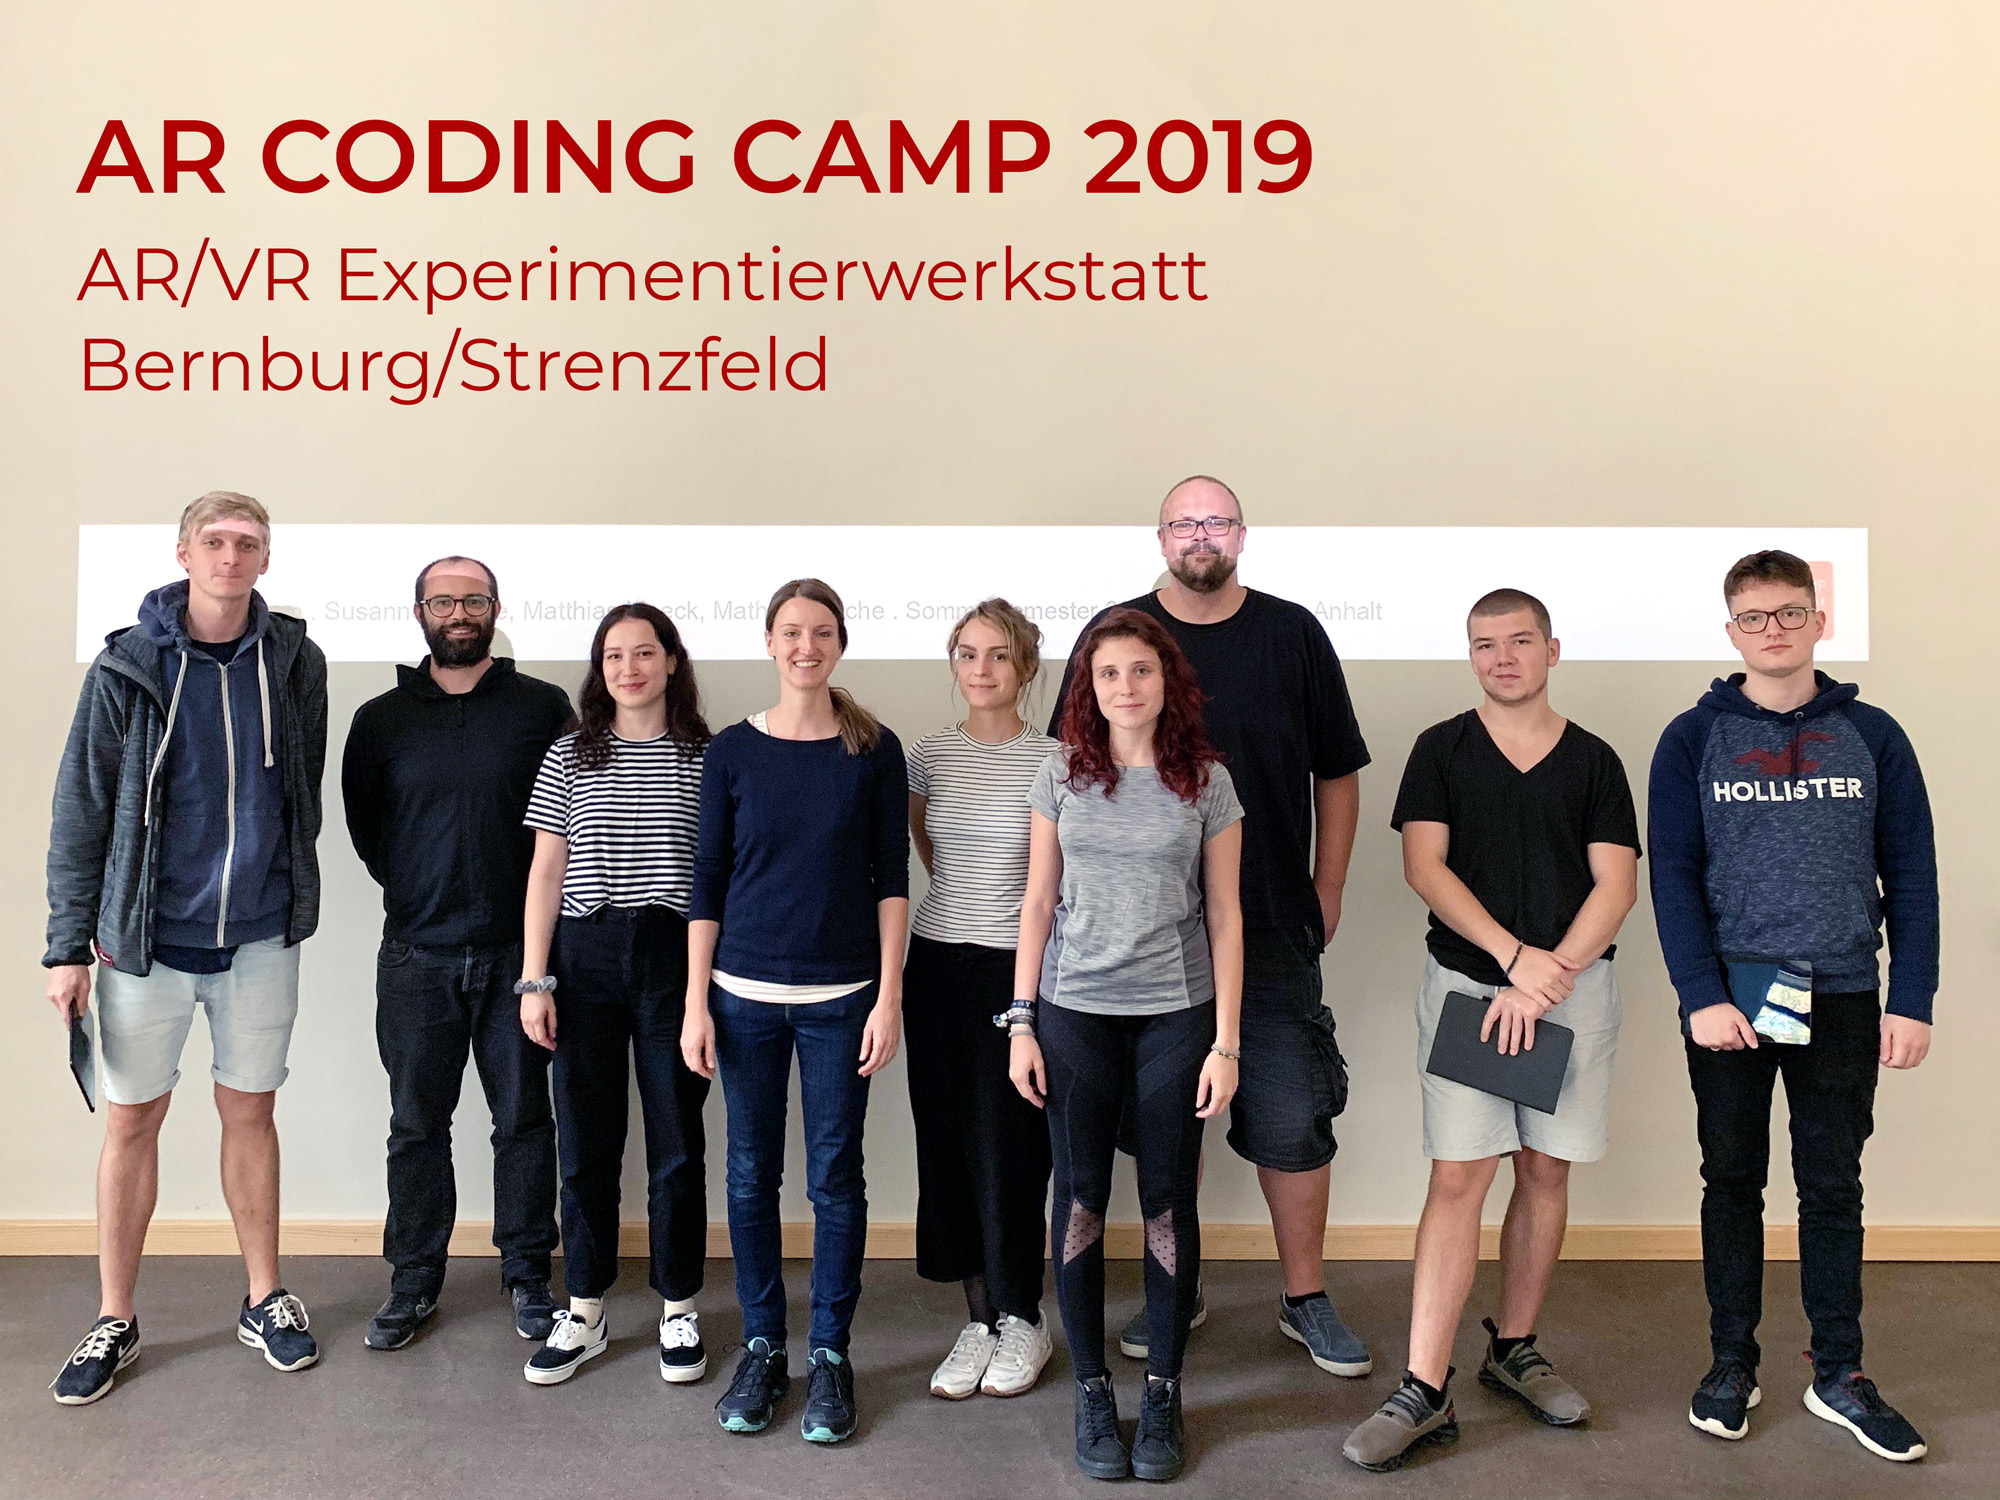 AR Coding Camp 2019